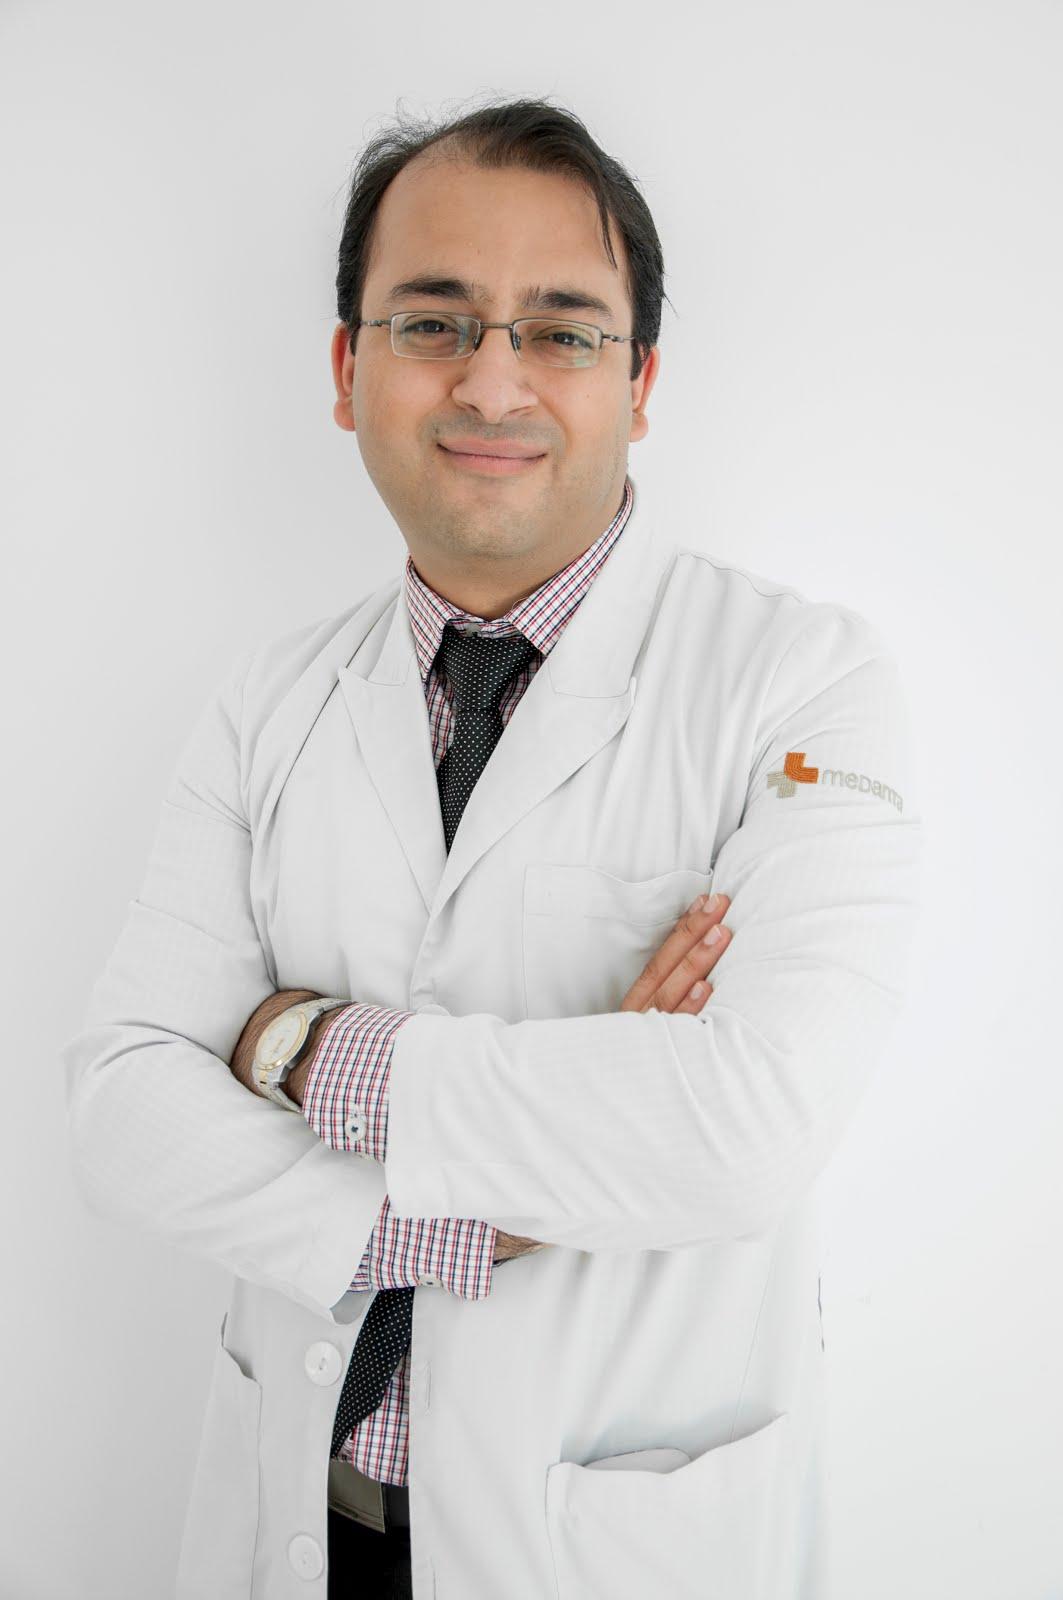 Dr Sidharth Sethi